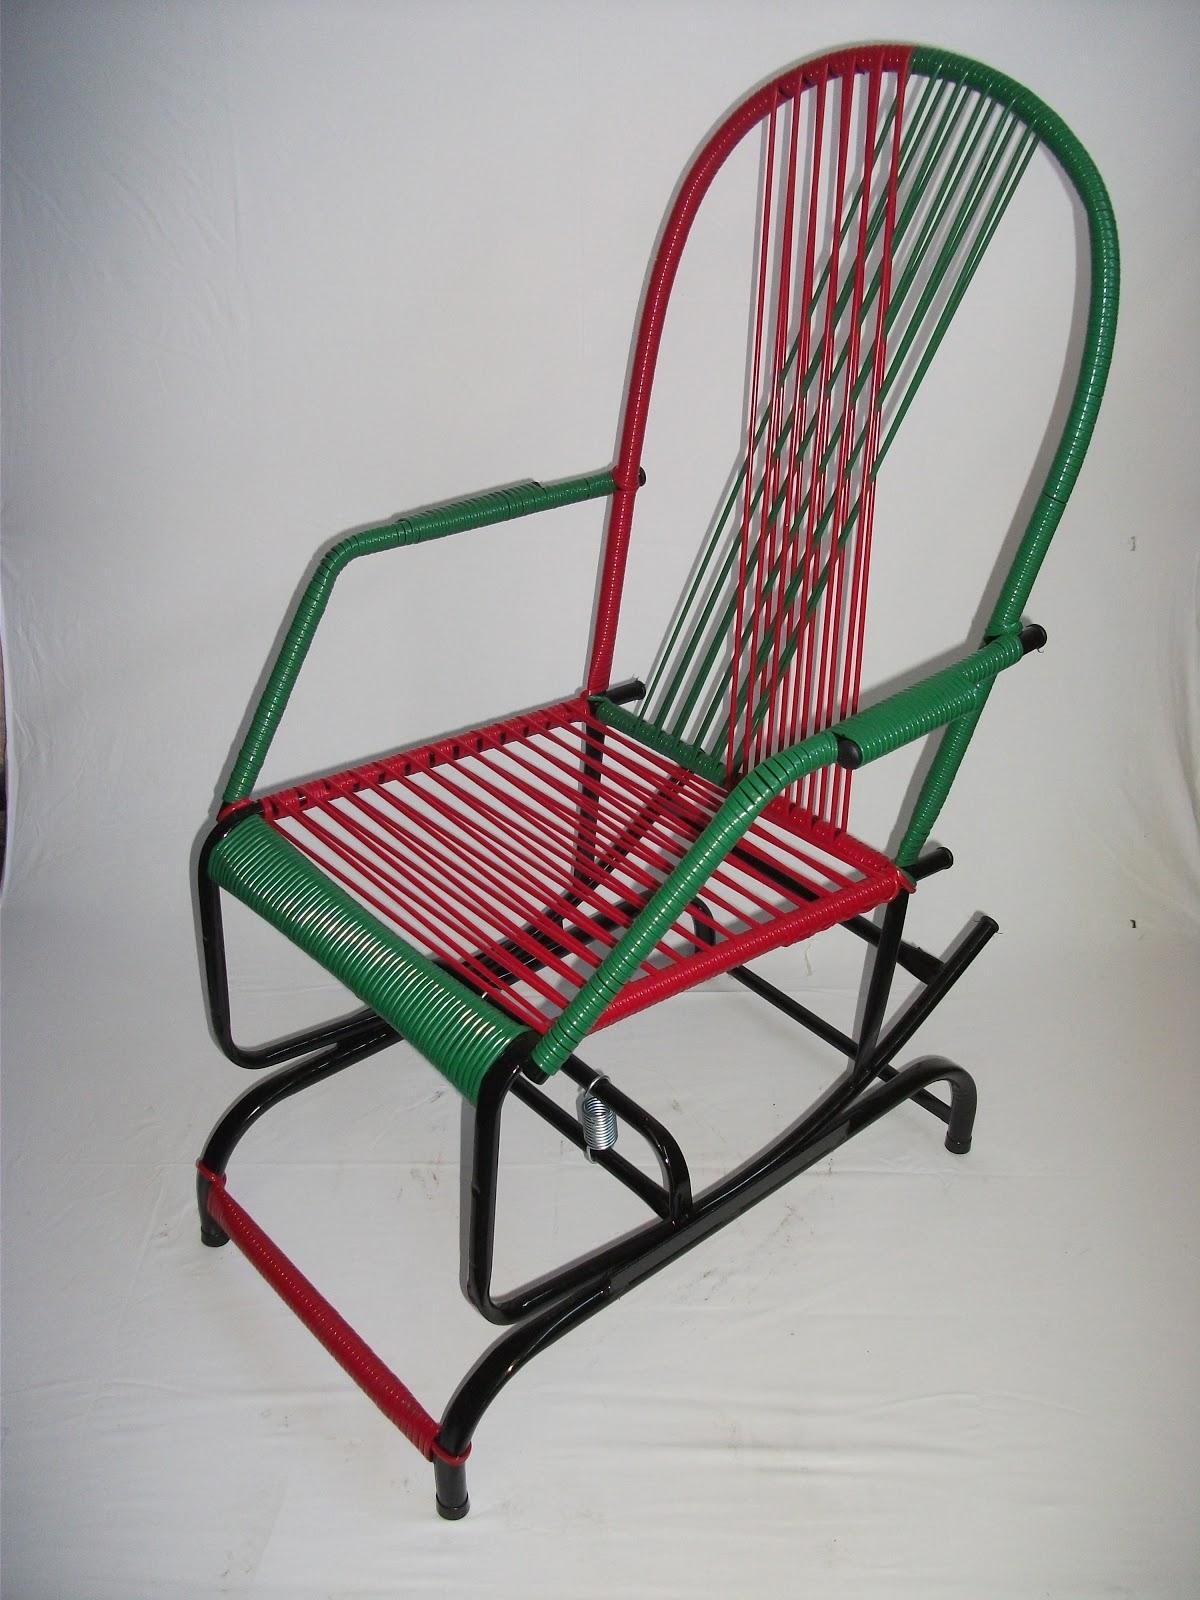 CADEIRAS DE BALANÇO: Cadeiras De Mola #83222D 1200x1600